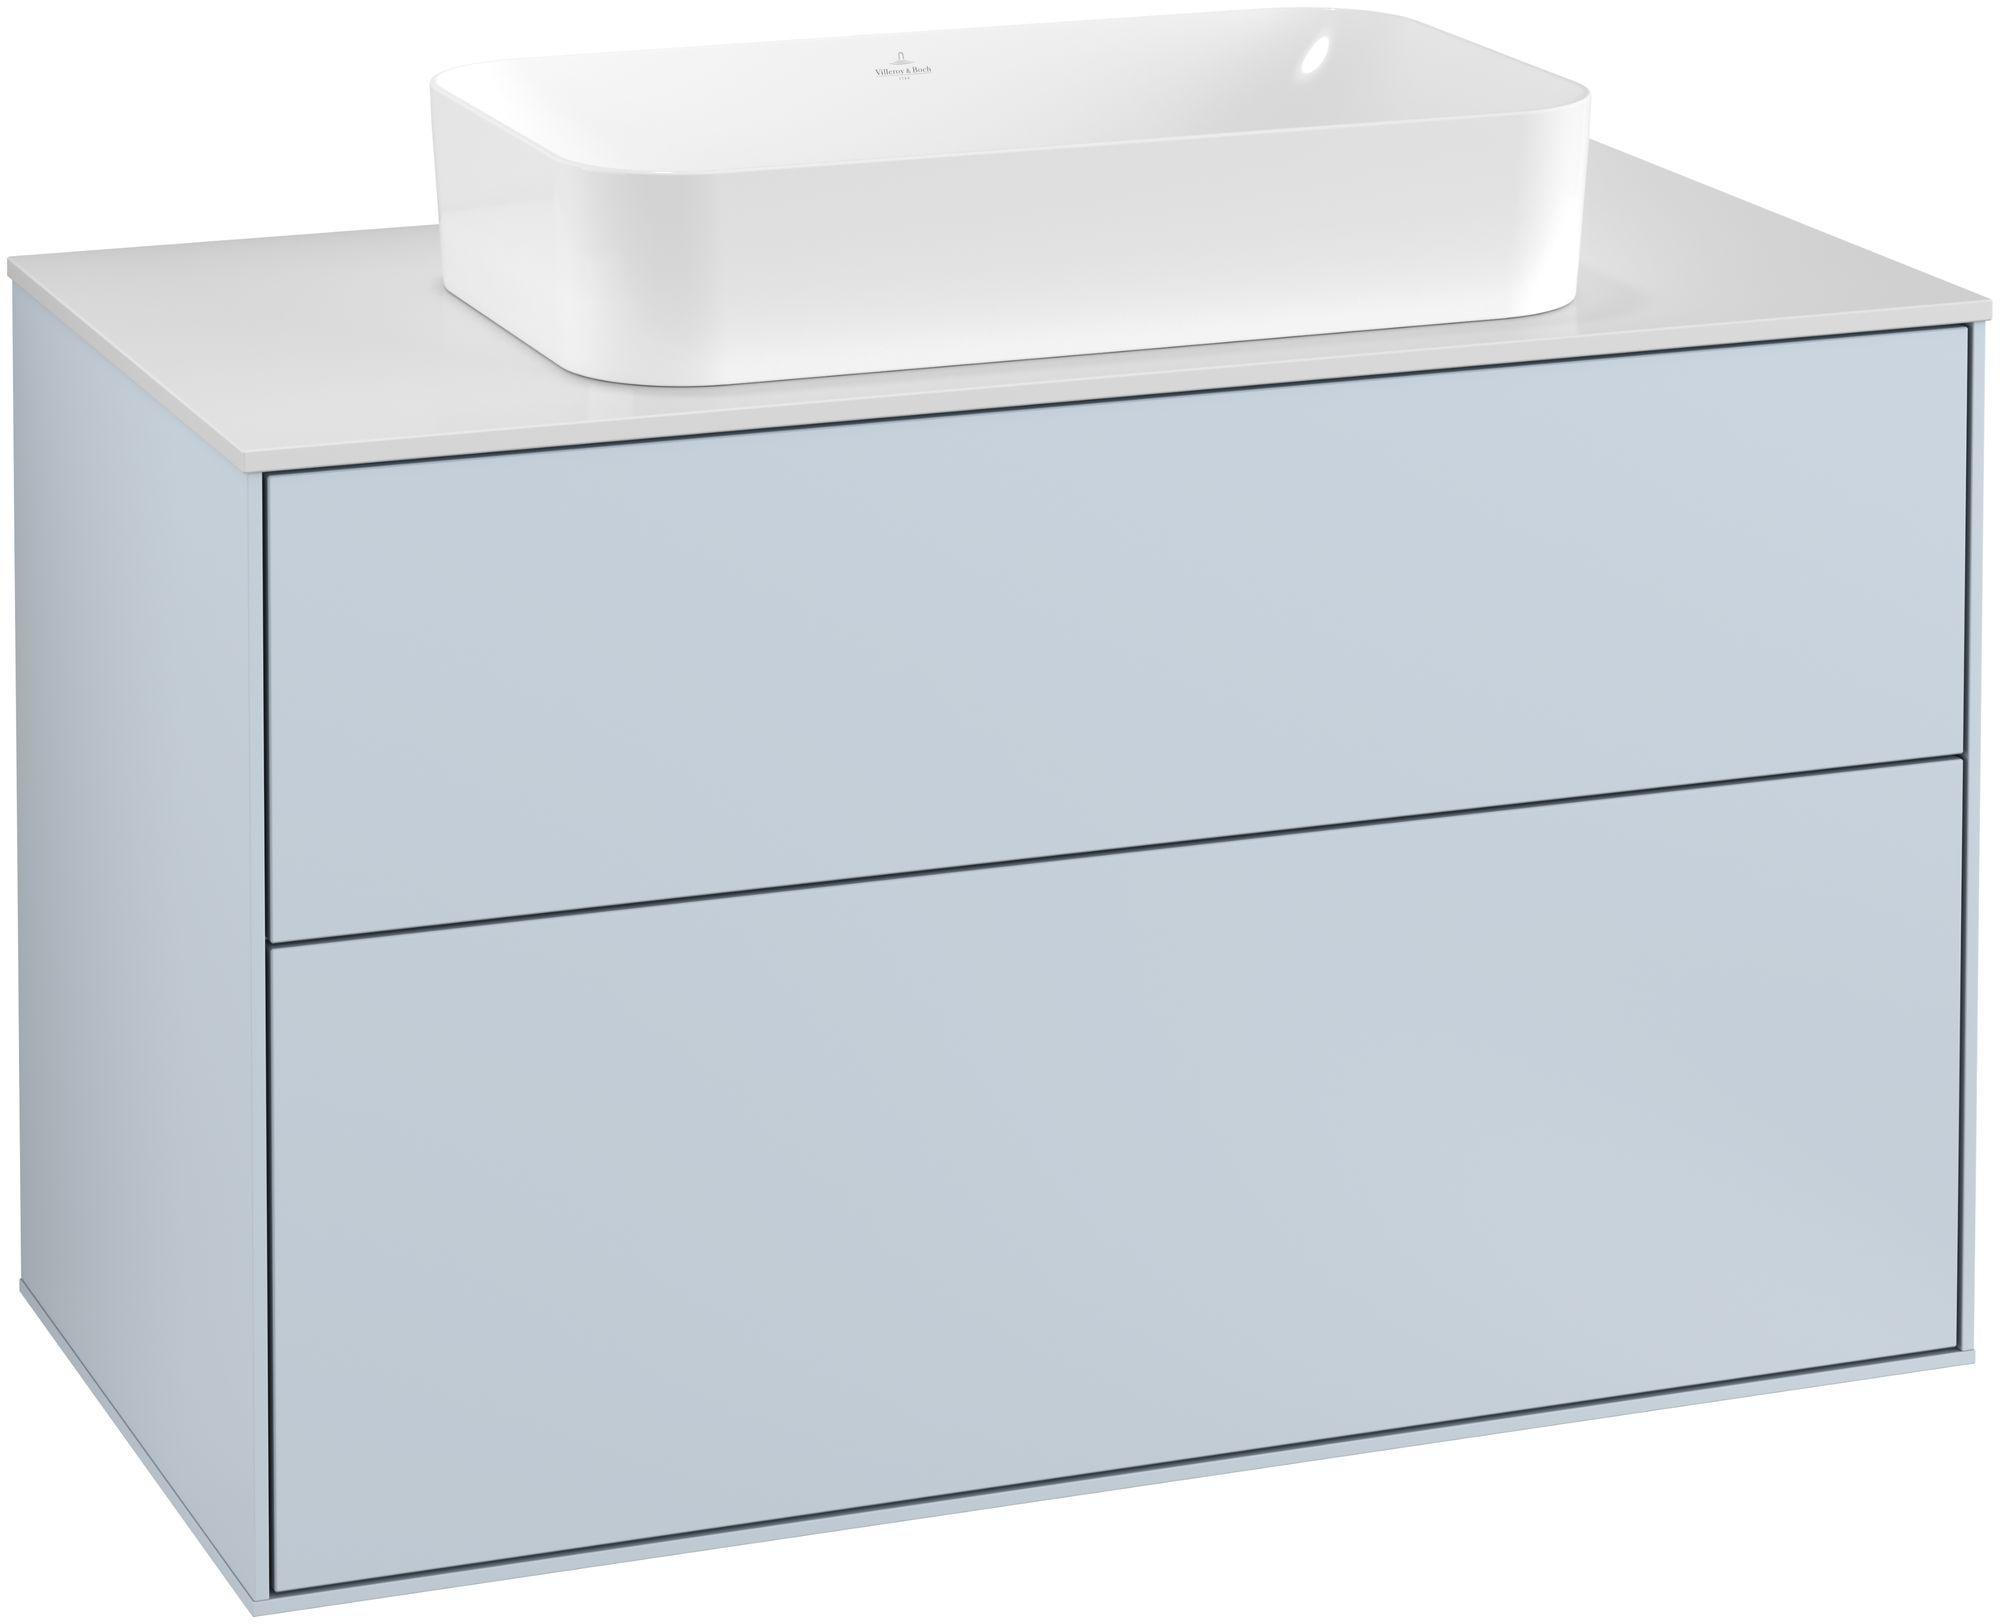 Villeroy & Boch Finion G23 Waschtischunterschrank 2 Auszüge Waschtisch mittig LED-Beleuchtung B:100xH:60,3xT:50,1cm Front, Korpus: Cloud, Glasplatte: White Matt G23100HA